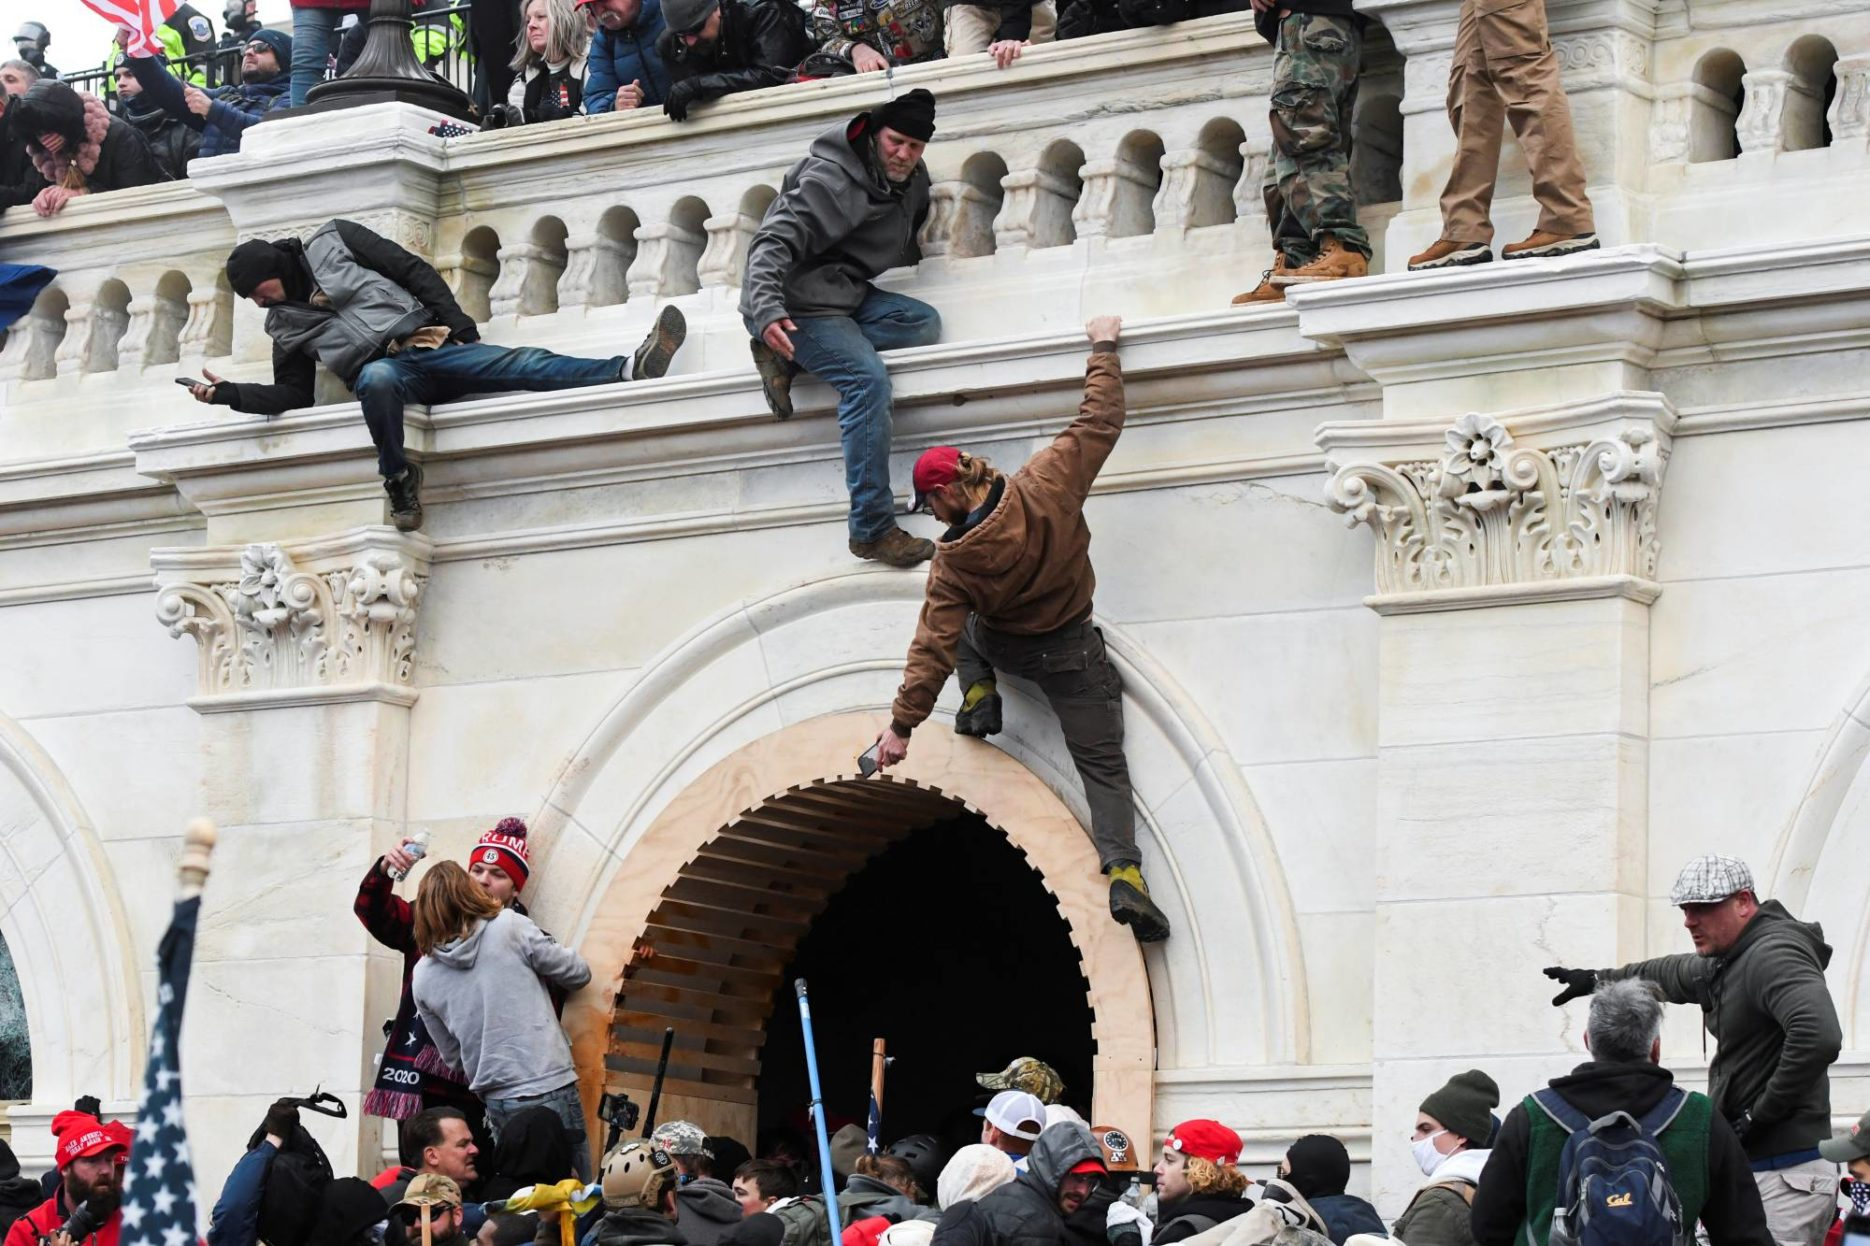 China responds to Capitol riot. Credit: REUTERS